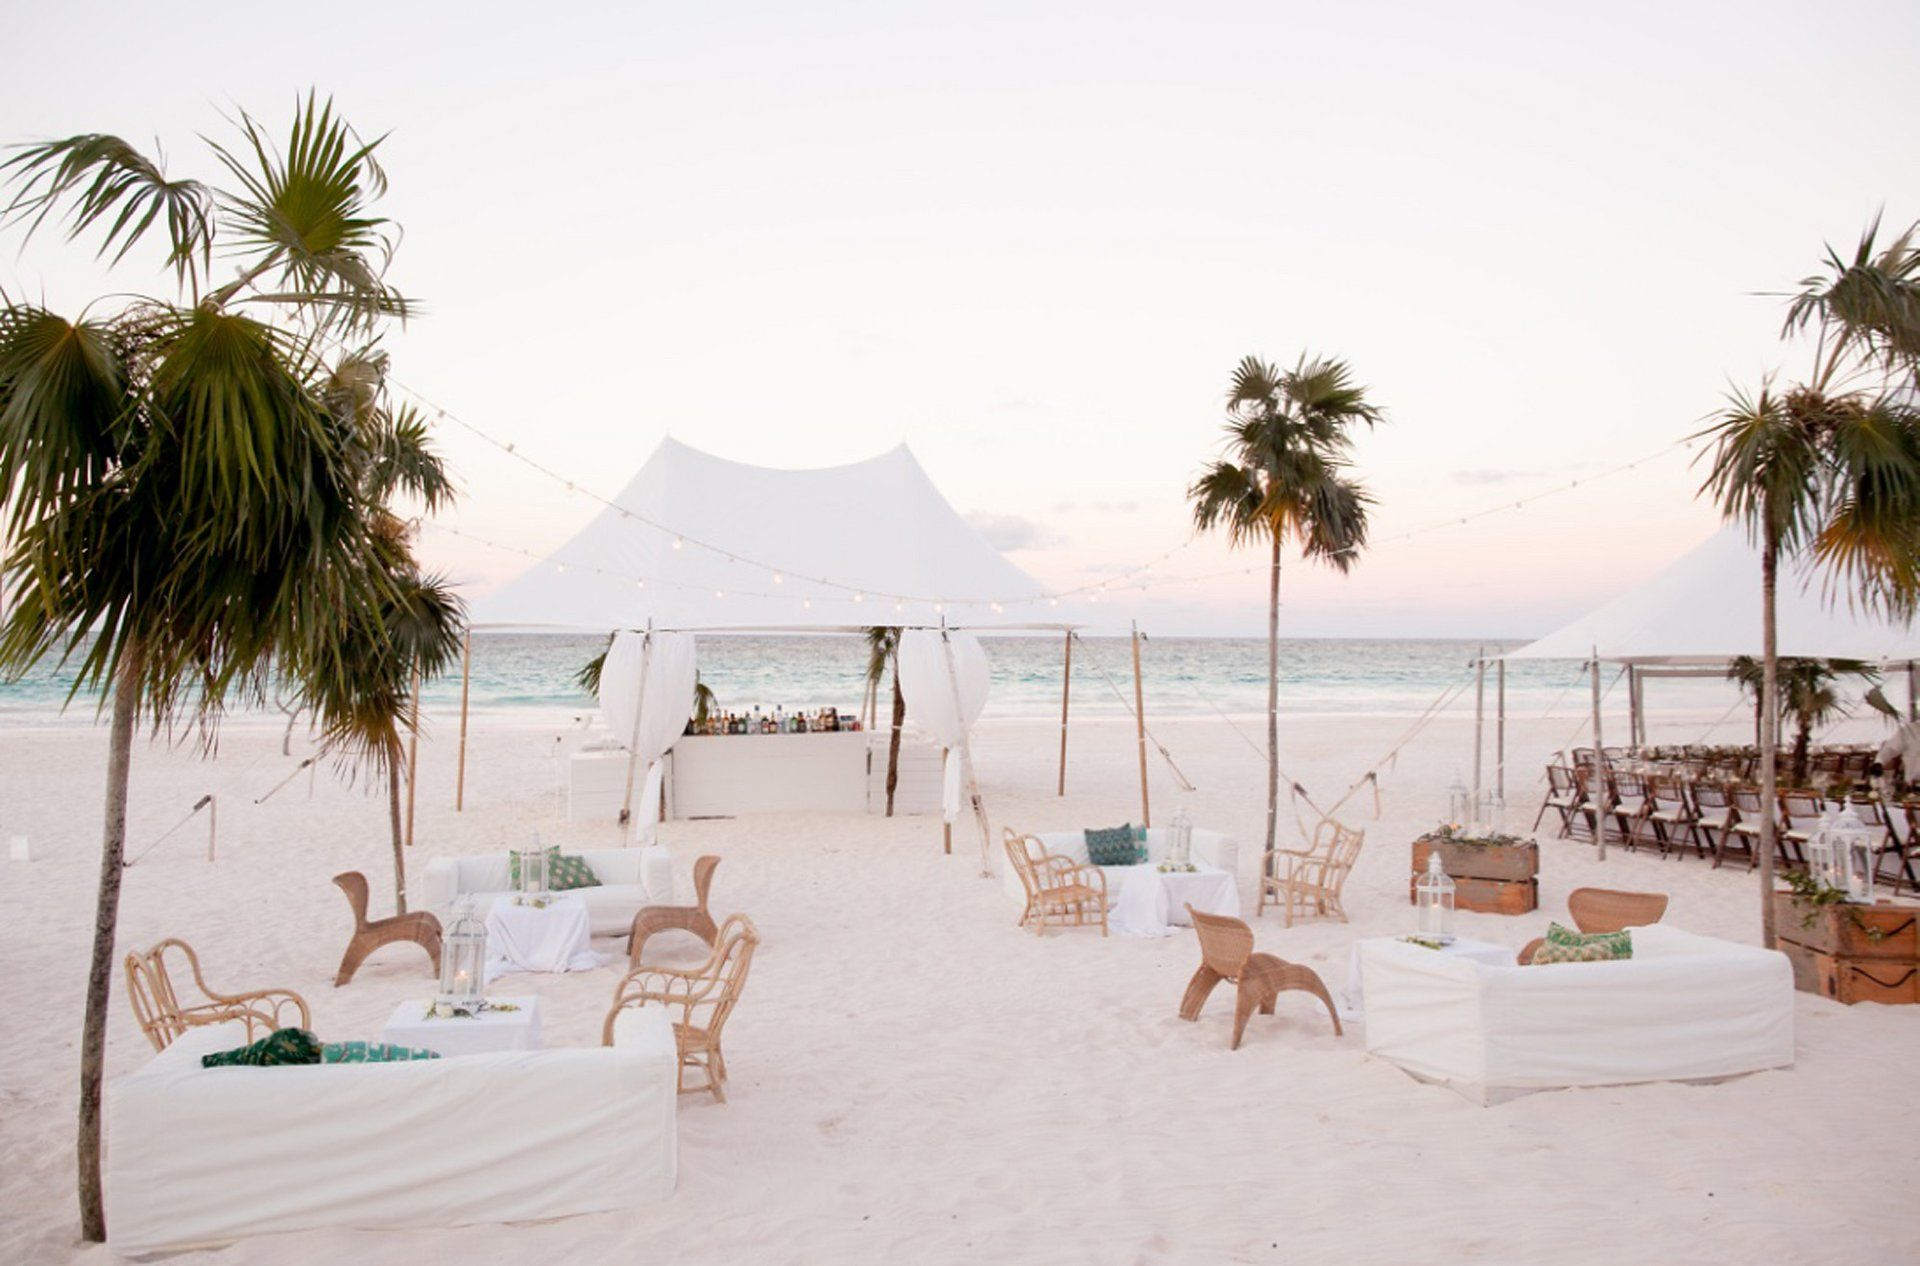 victoria lampley\'s wedding | Beach wedding | Pinterest | Harbor ...